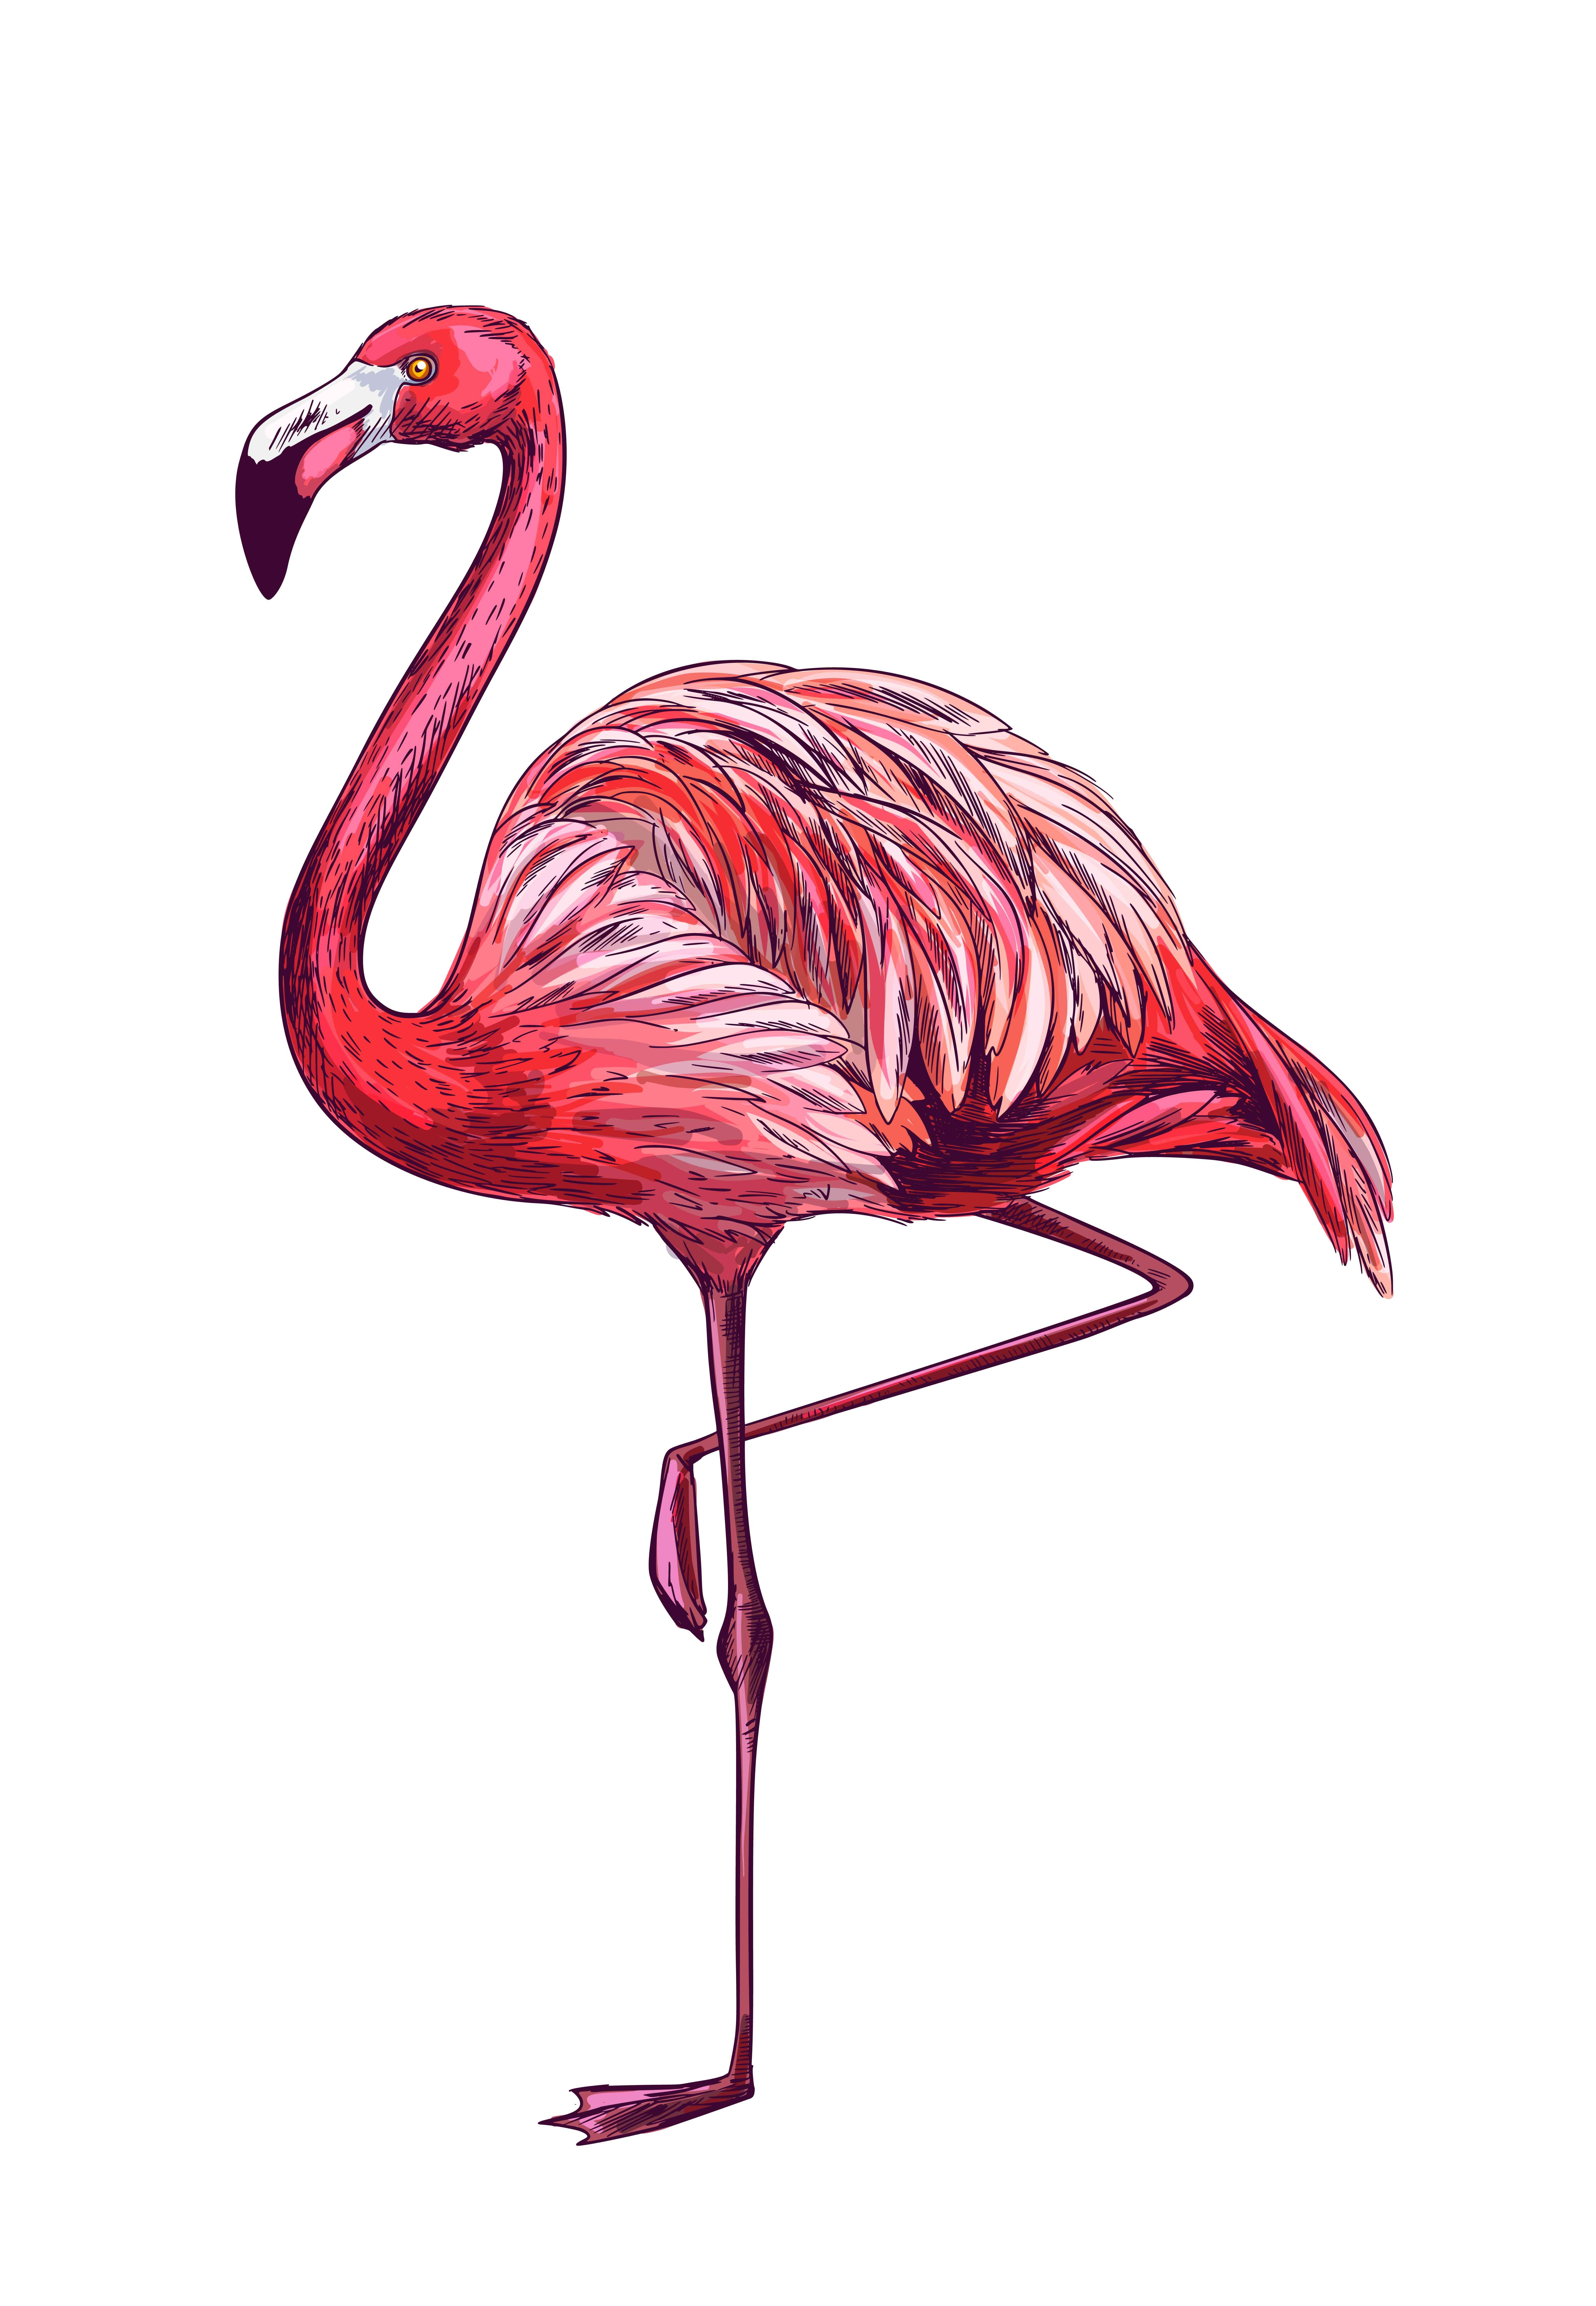 standing flamingo on white bg, full color sketch, hand drawn vector  illustratio…   flamingos art illustration, hand drawn vector illustrations,  how to draw flamingo  pinterest